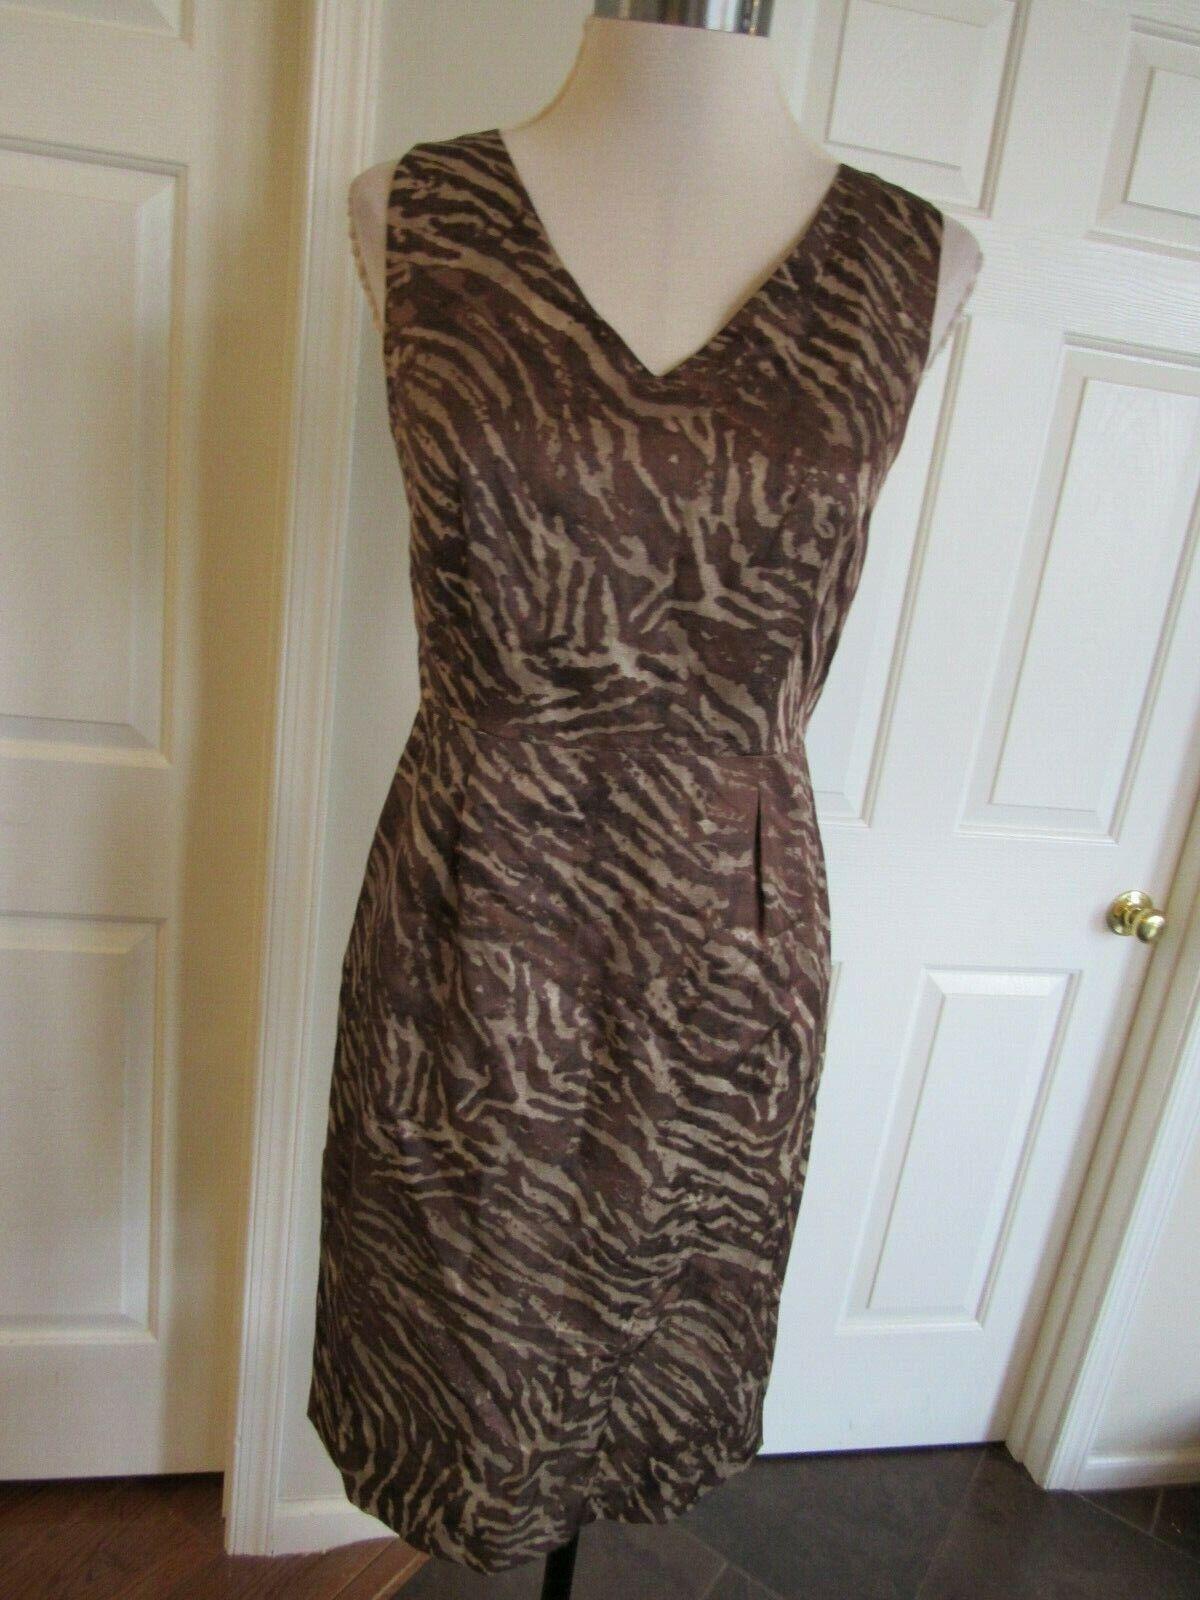 NWT Banana Republic Women's Brown/Tan Sleeveless Sheath Lined Dress Sz 4 $140